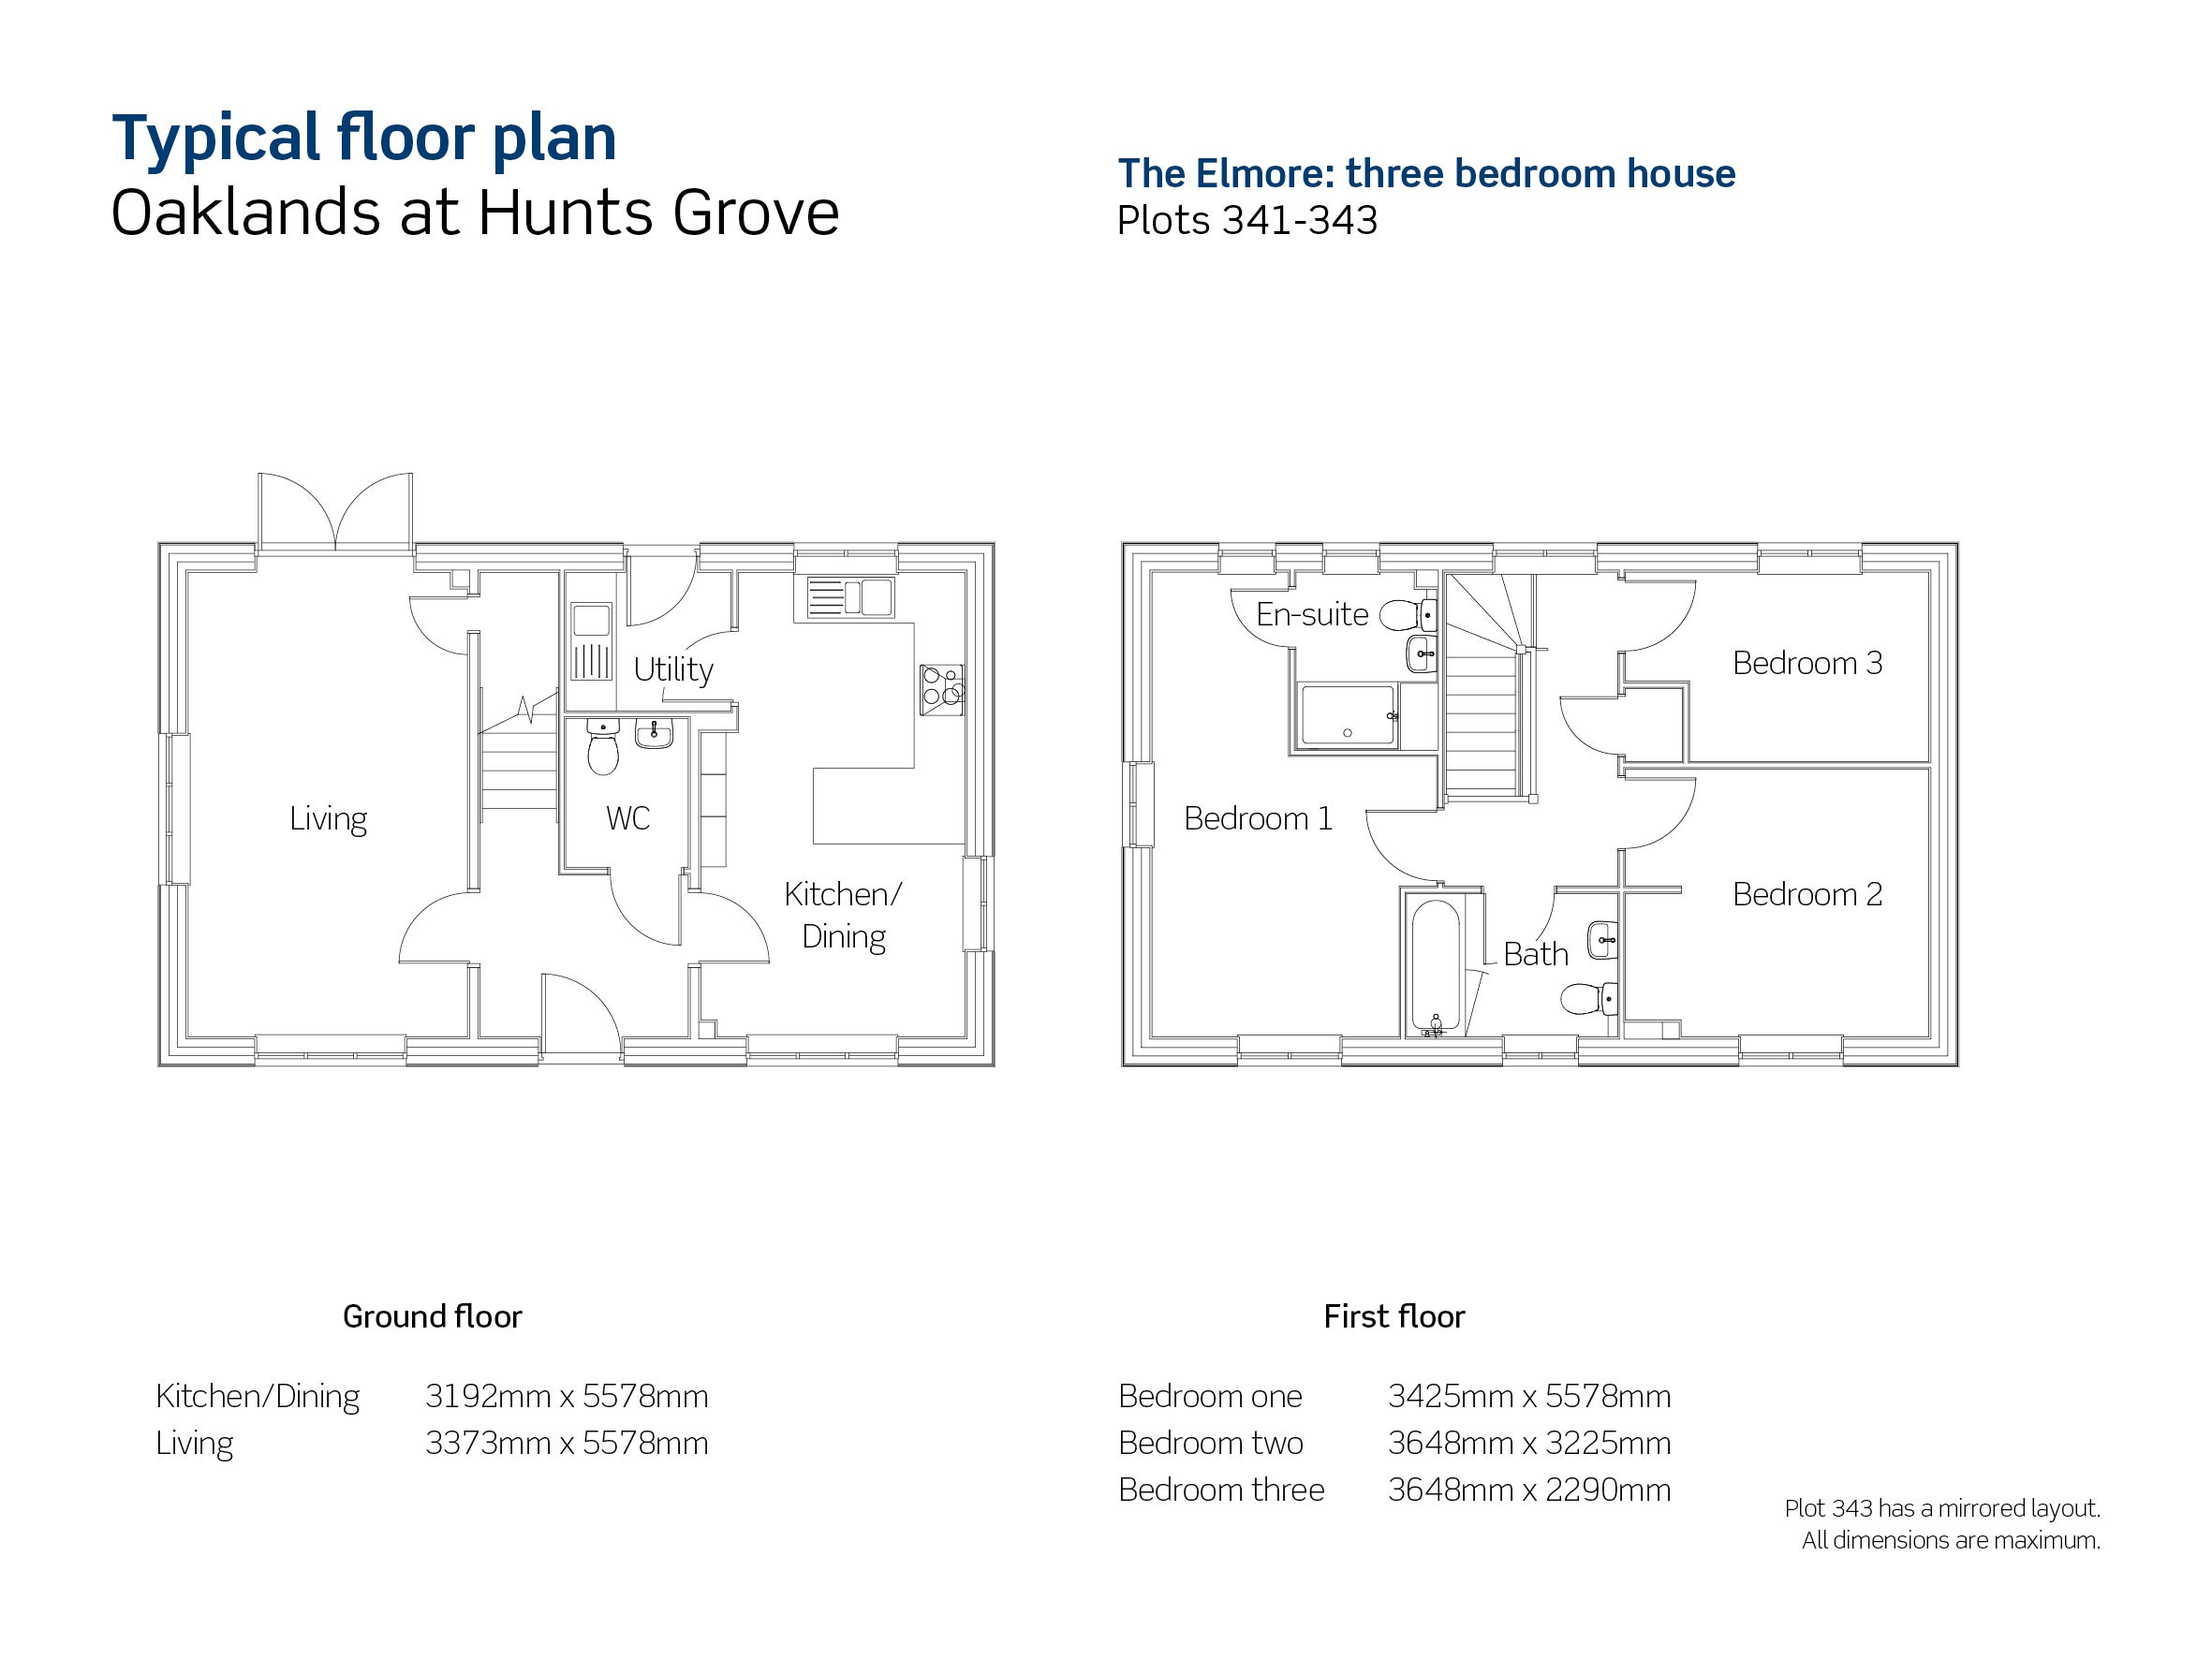 Drawing of Oaklands The Elmore floor plan